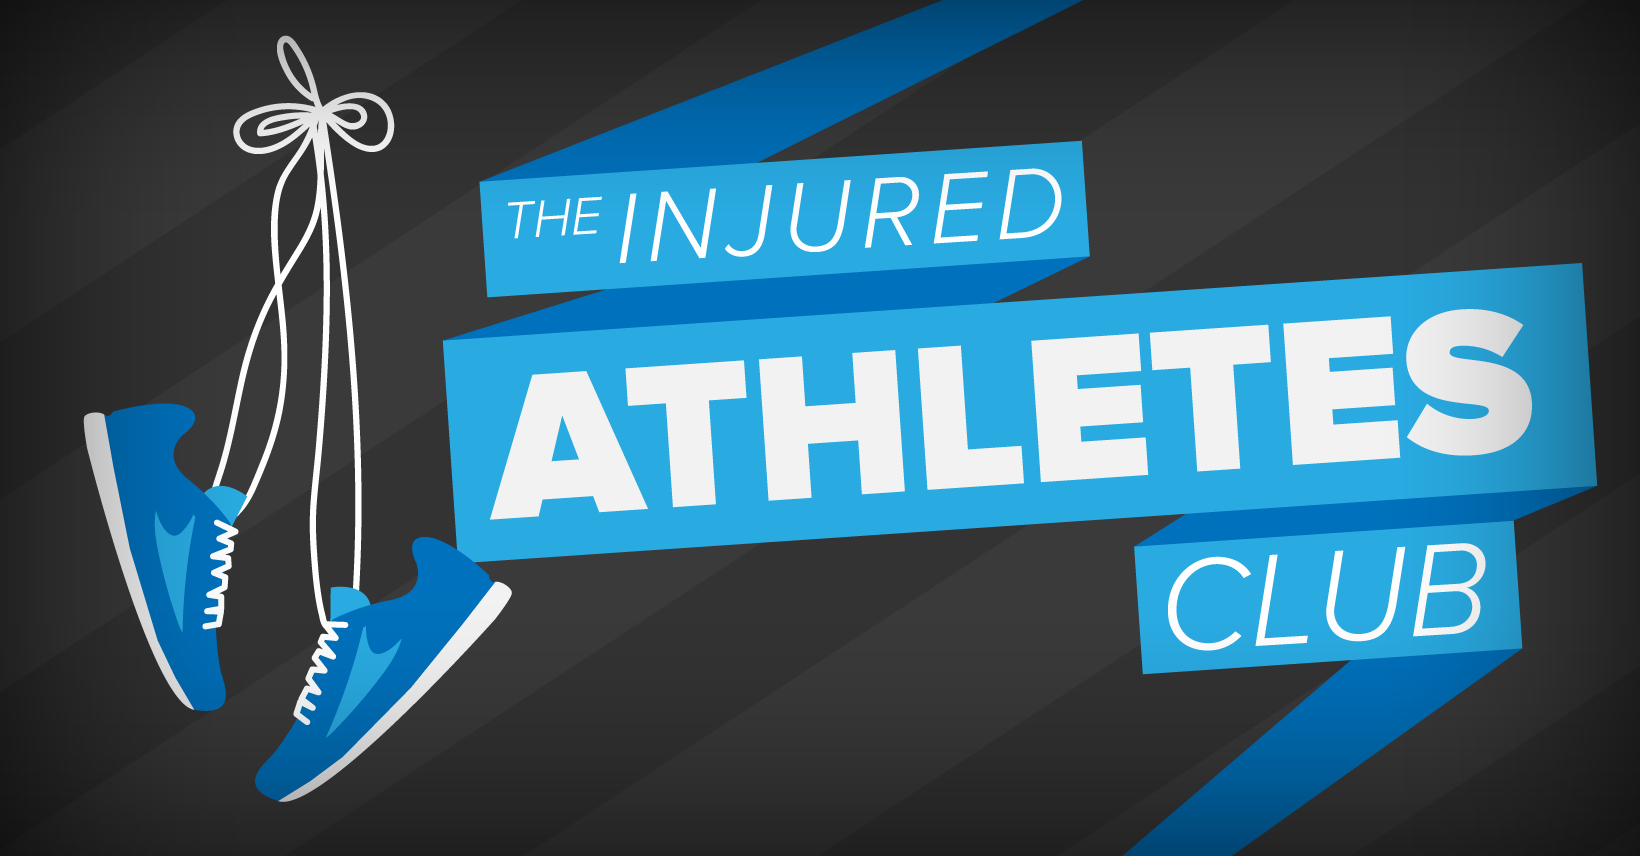 The Injured Athletes Club